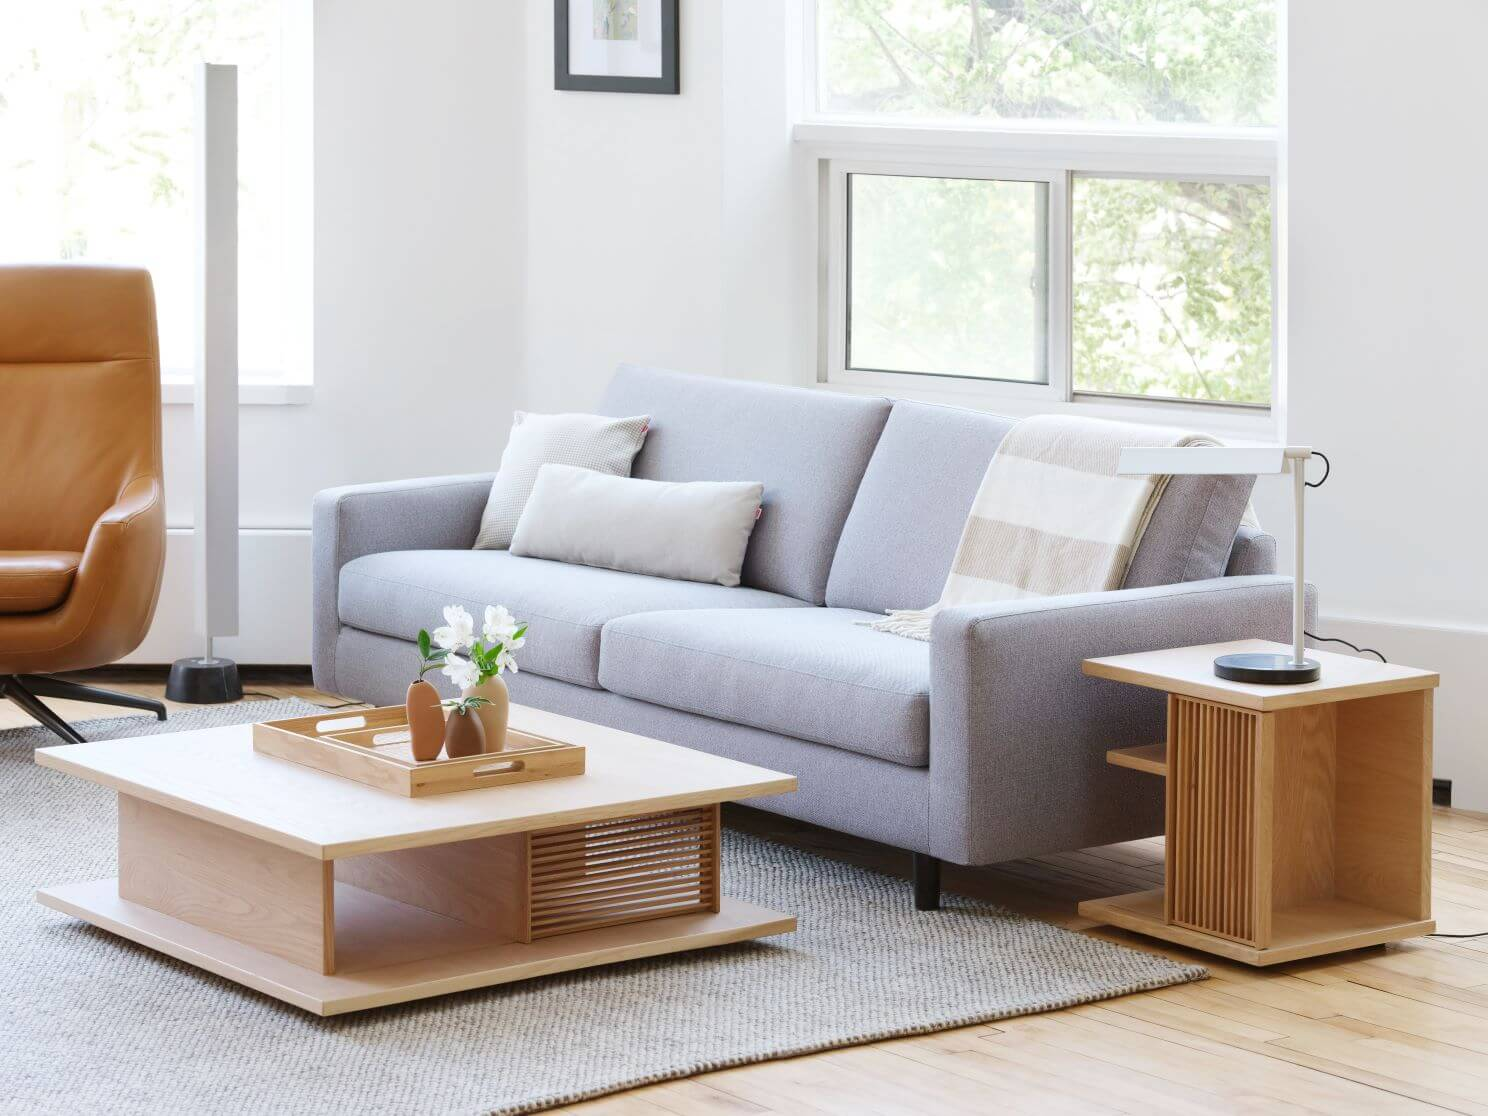 Tremendous Oskar Sofa Dailytribune Chair Design For Home Dailytribuneorg